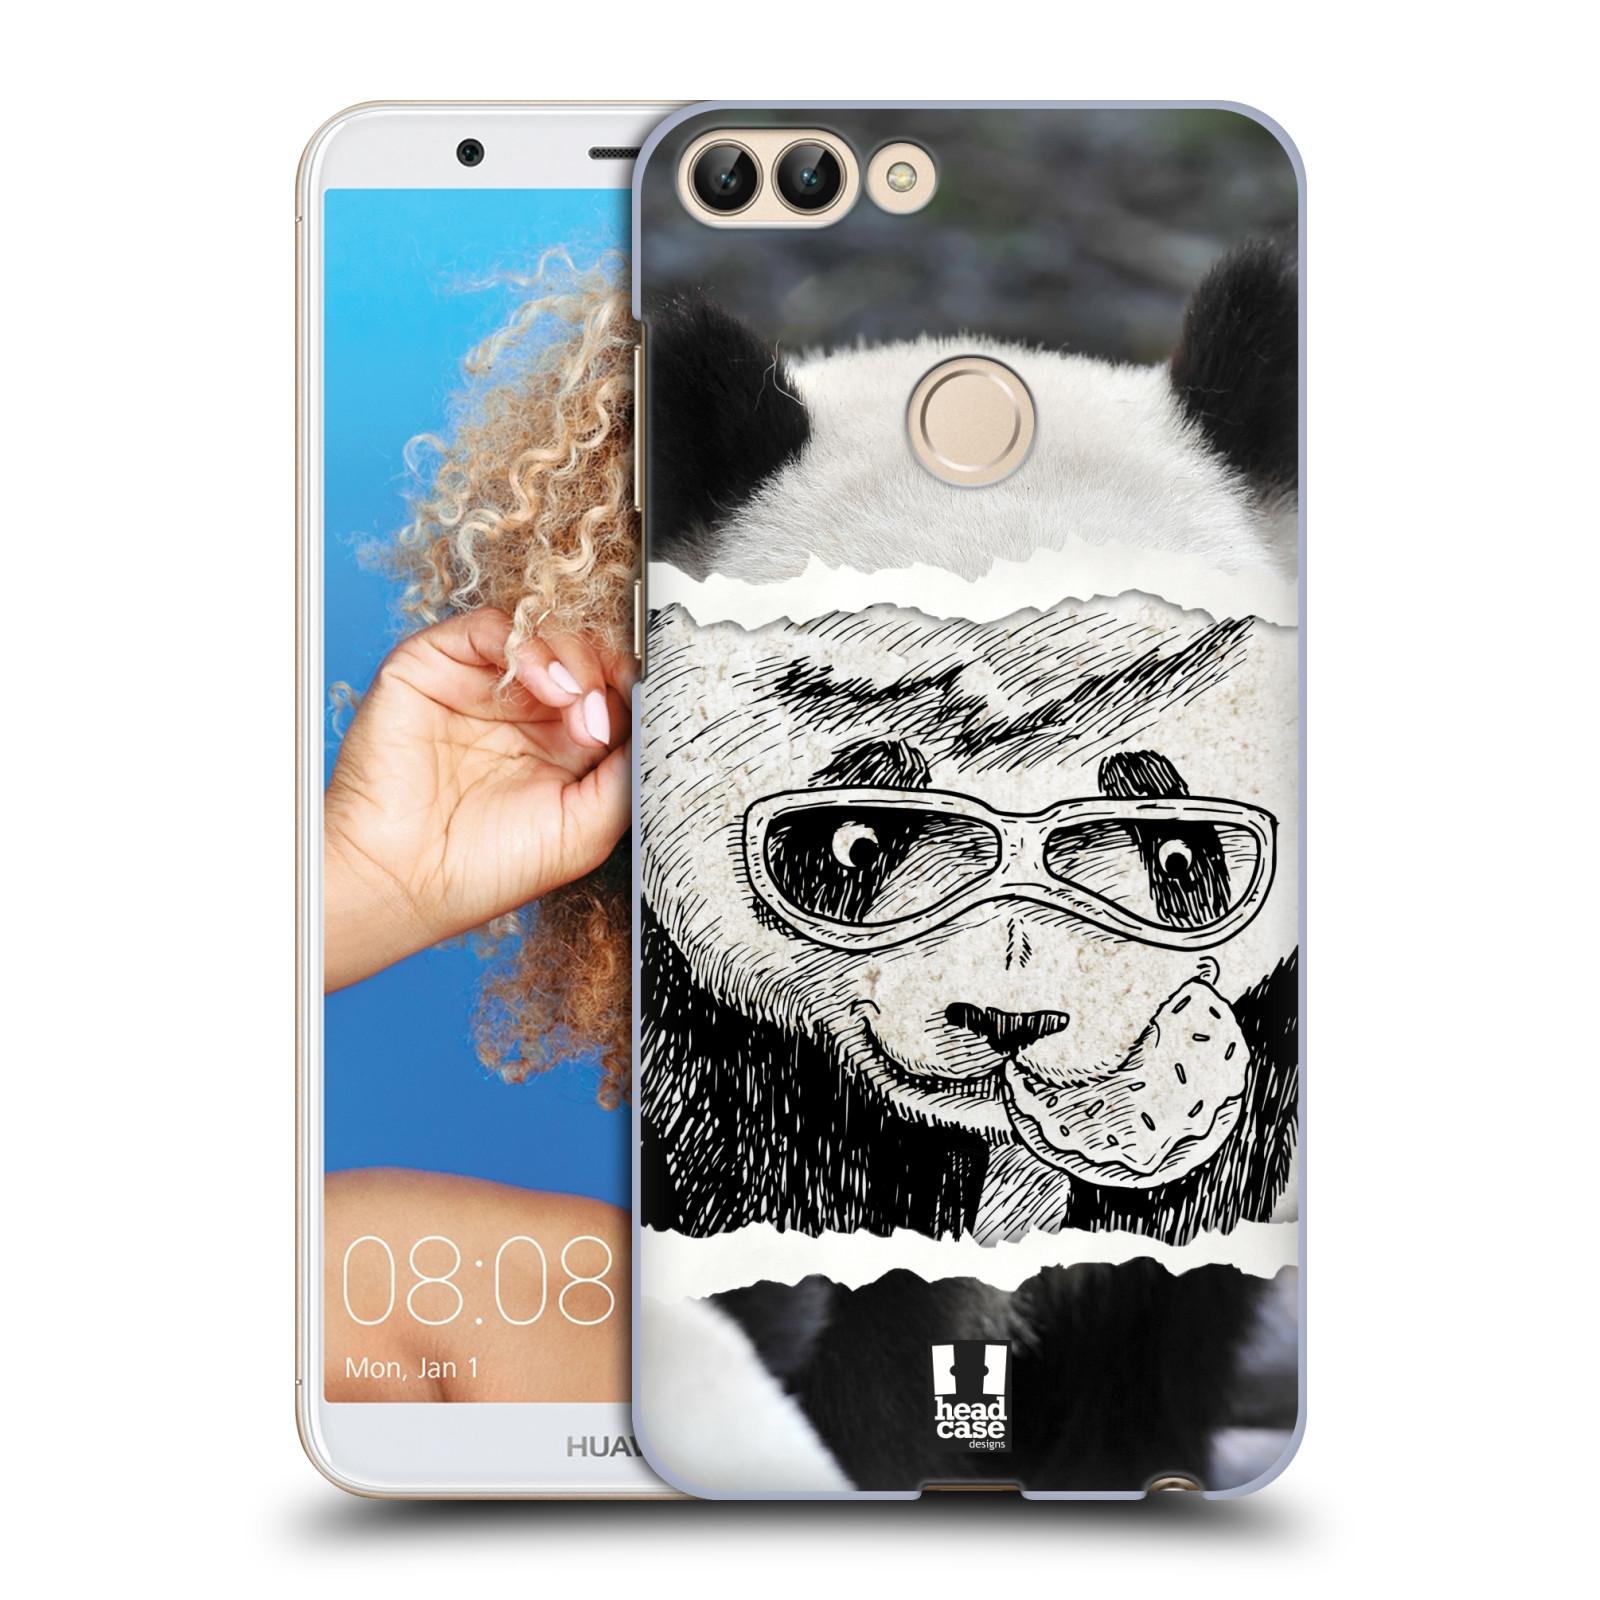 HEAD CASE plastový obal na mobil Huawei P Smart vzor zvířata koláž roztomilá panda